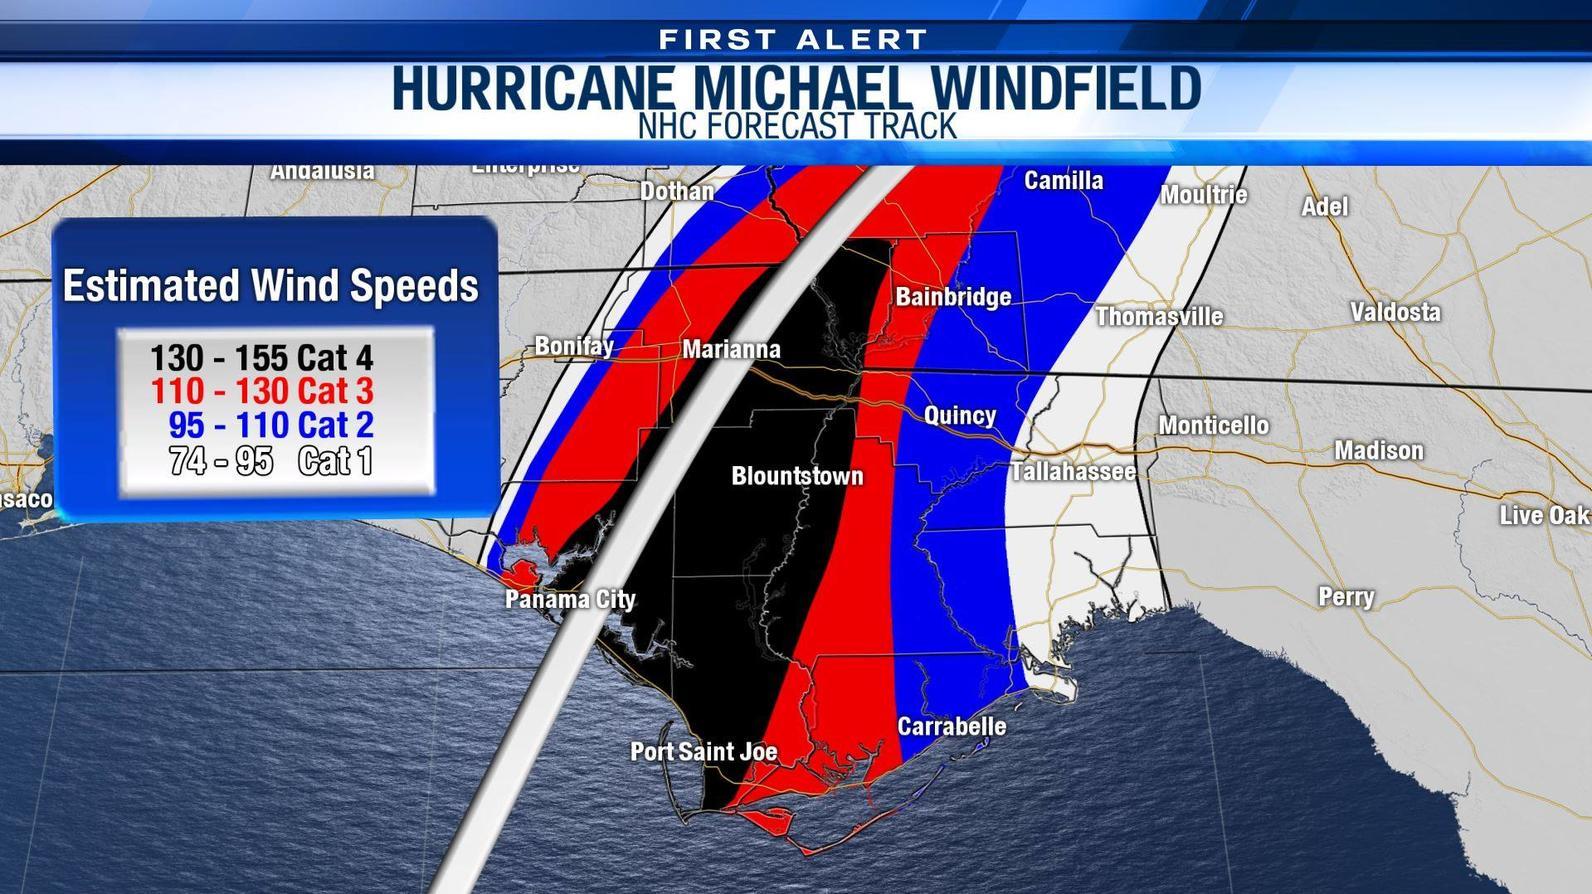 Path of Hurricane Michael 2018